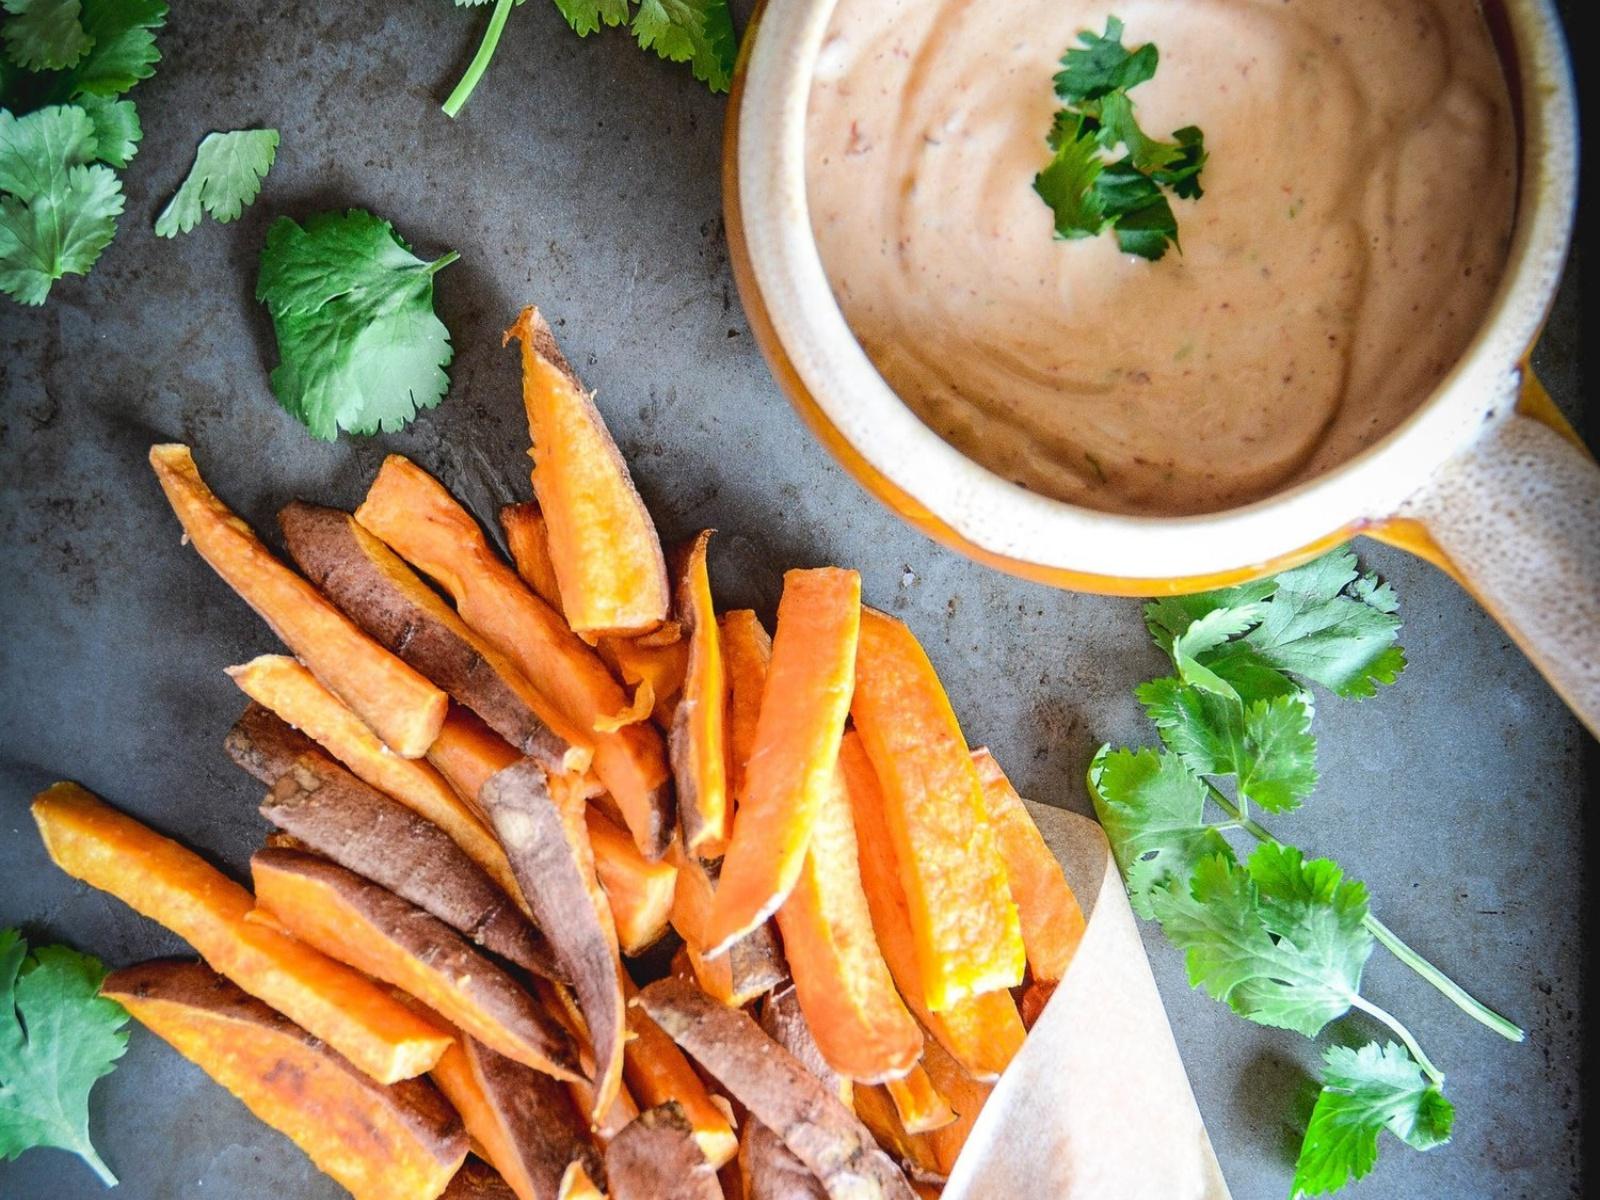 Vegan Sweet Potato Fries with Chipotle Lime Mayo